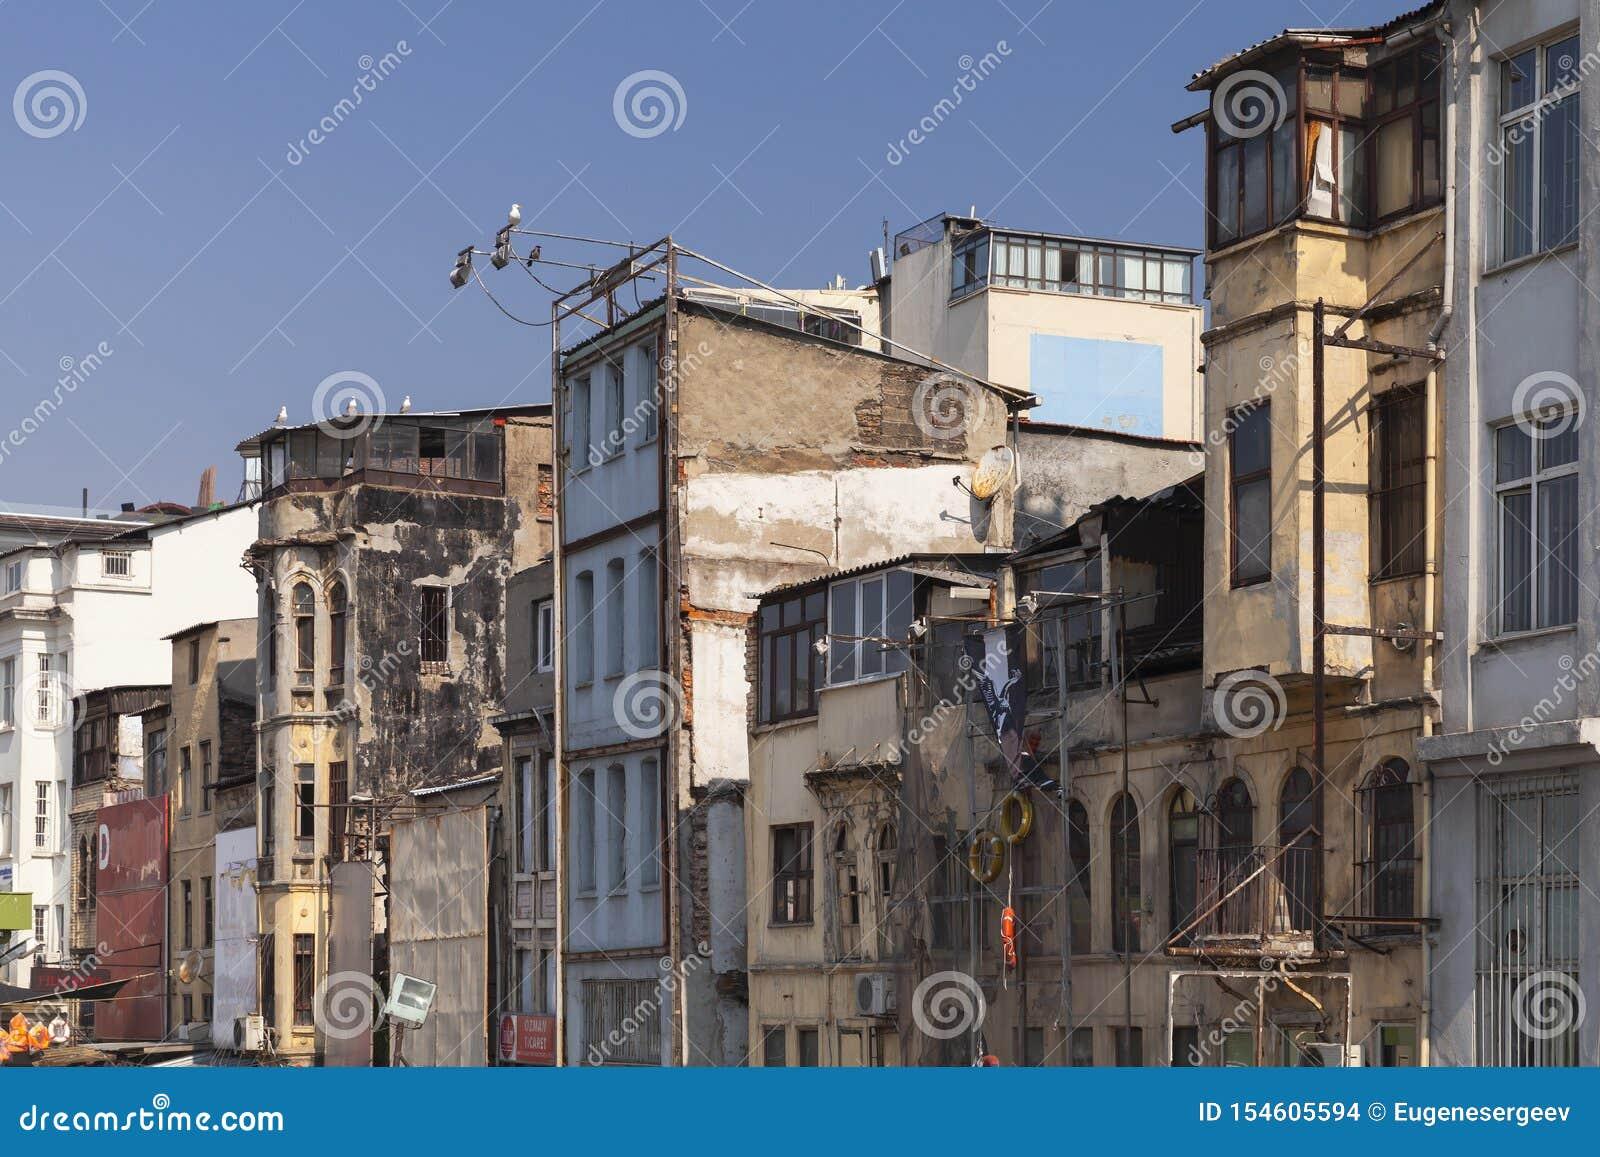 Old houses of Karakoy, Istanbul, Turkey